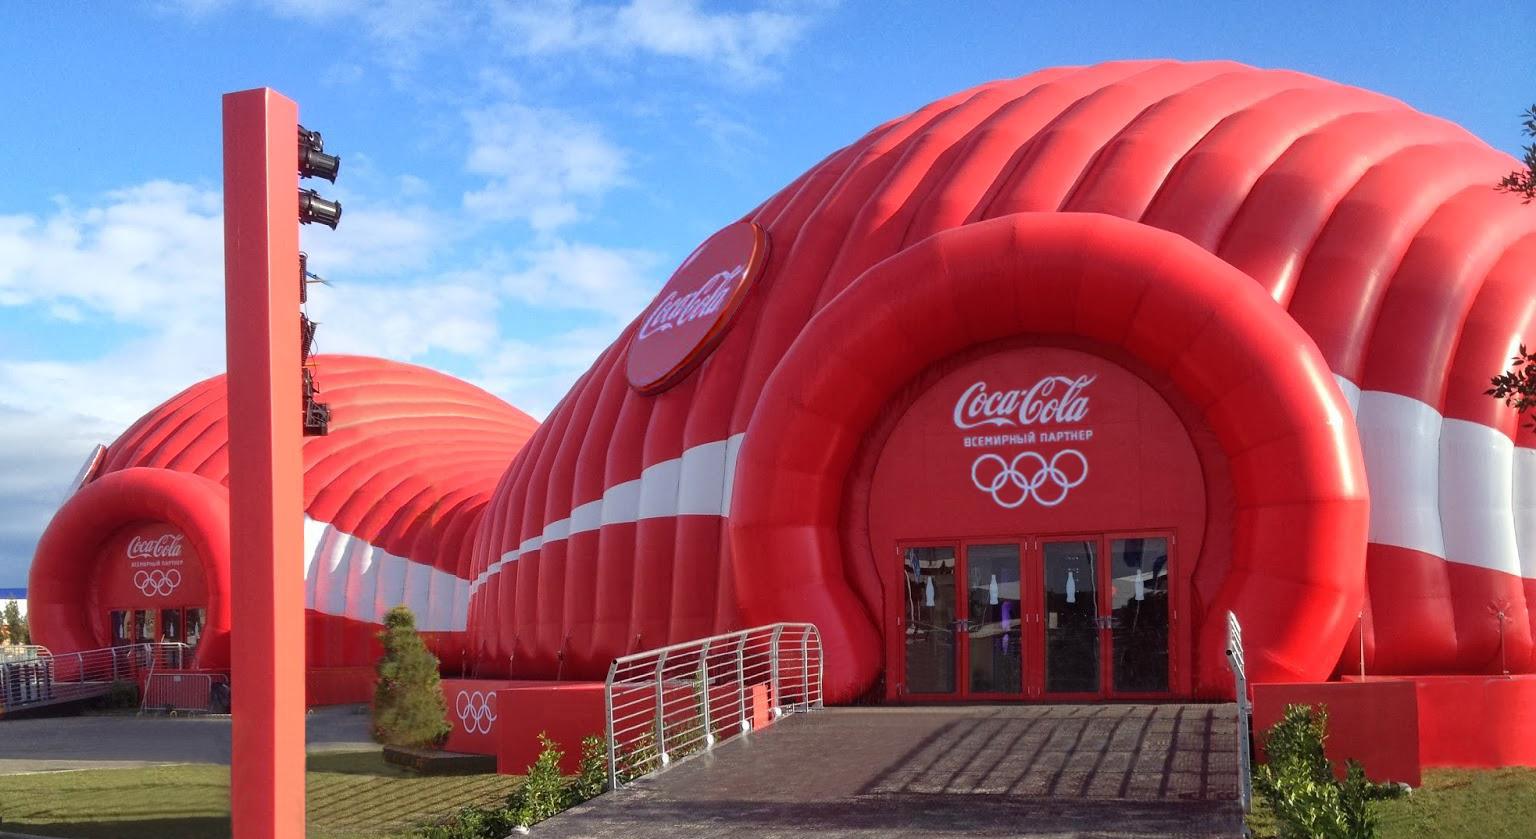 COCA-COLA SOCHI 2014 OLYMPIC SHOWCASE